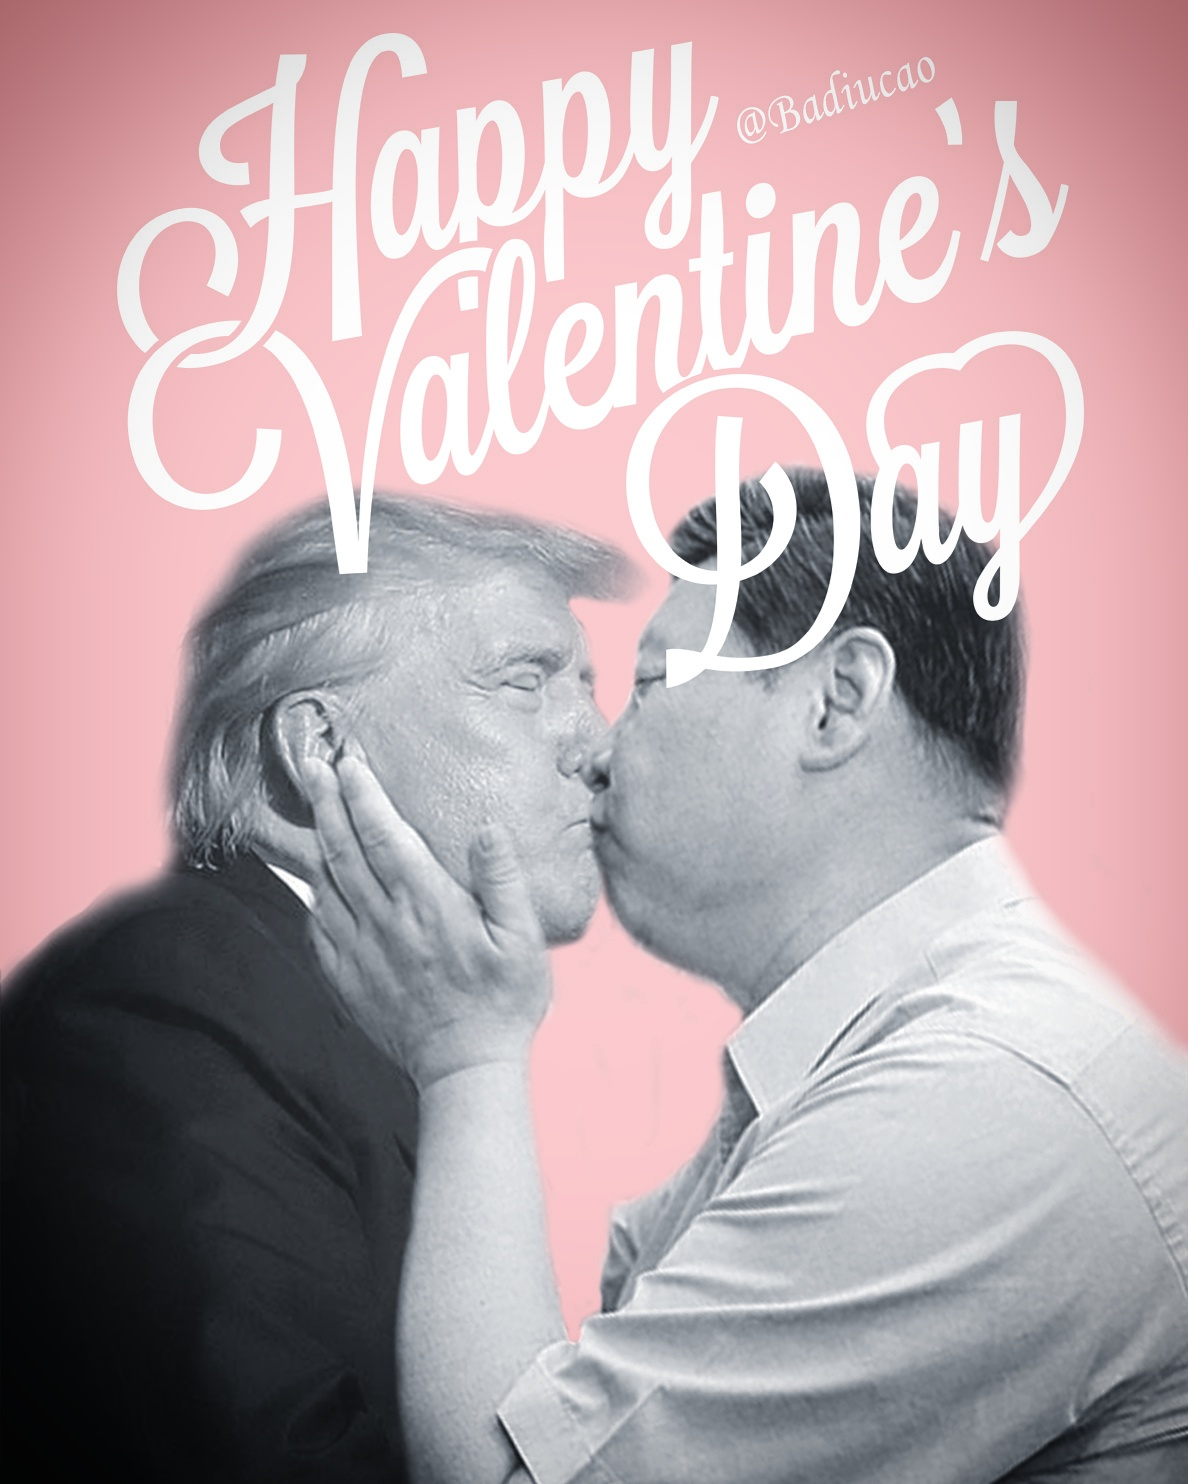 Badiucao: One Love, One China